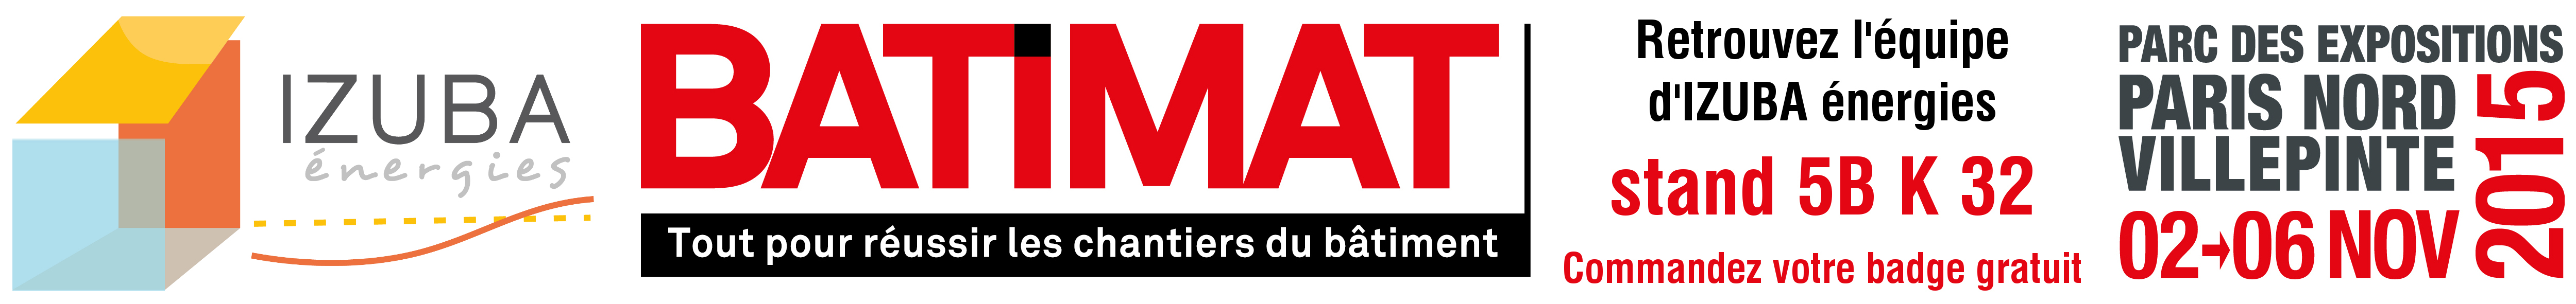 Bandeau Batimat 2015 IZUBA énergies